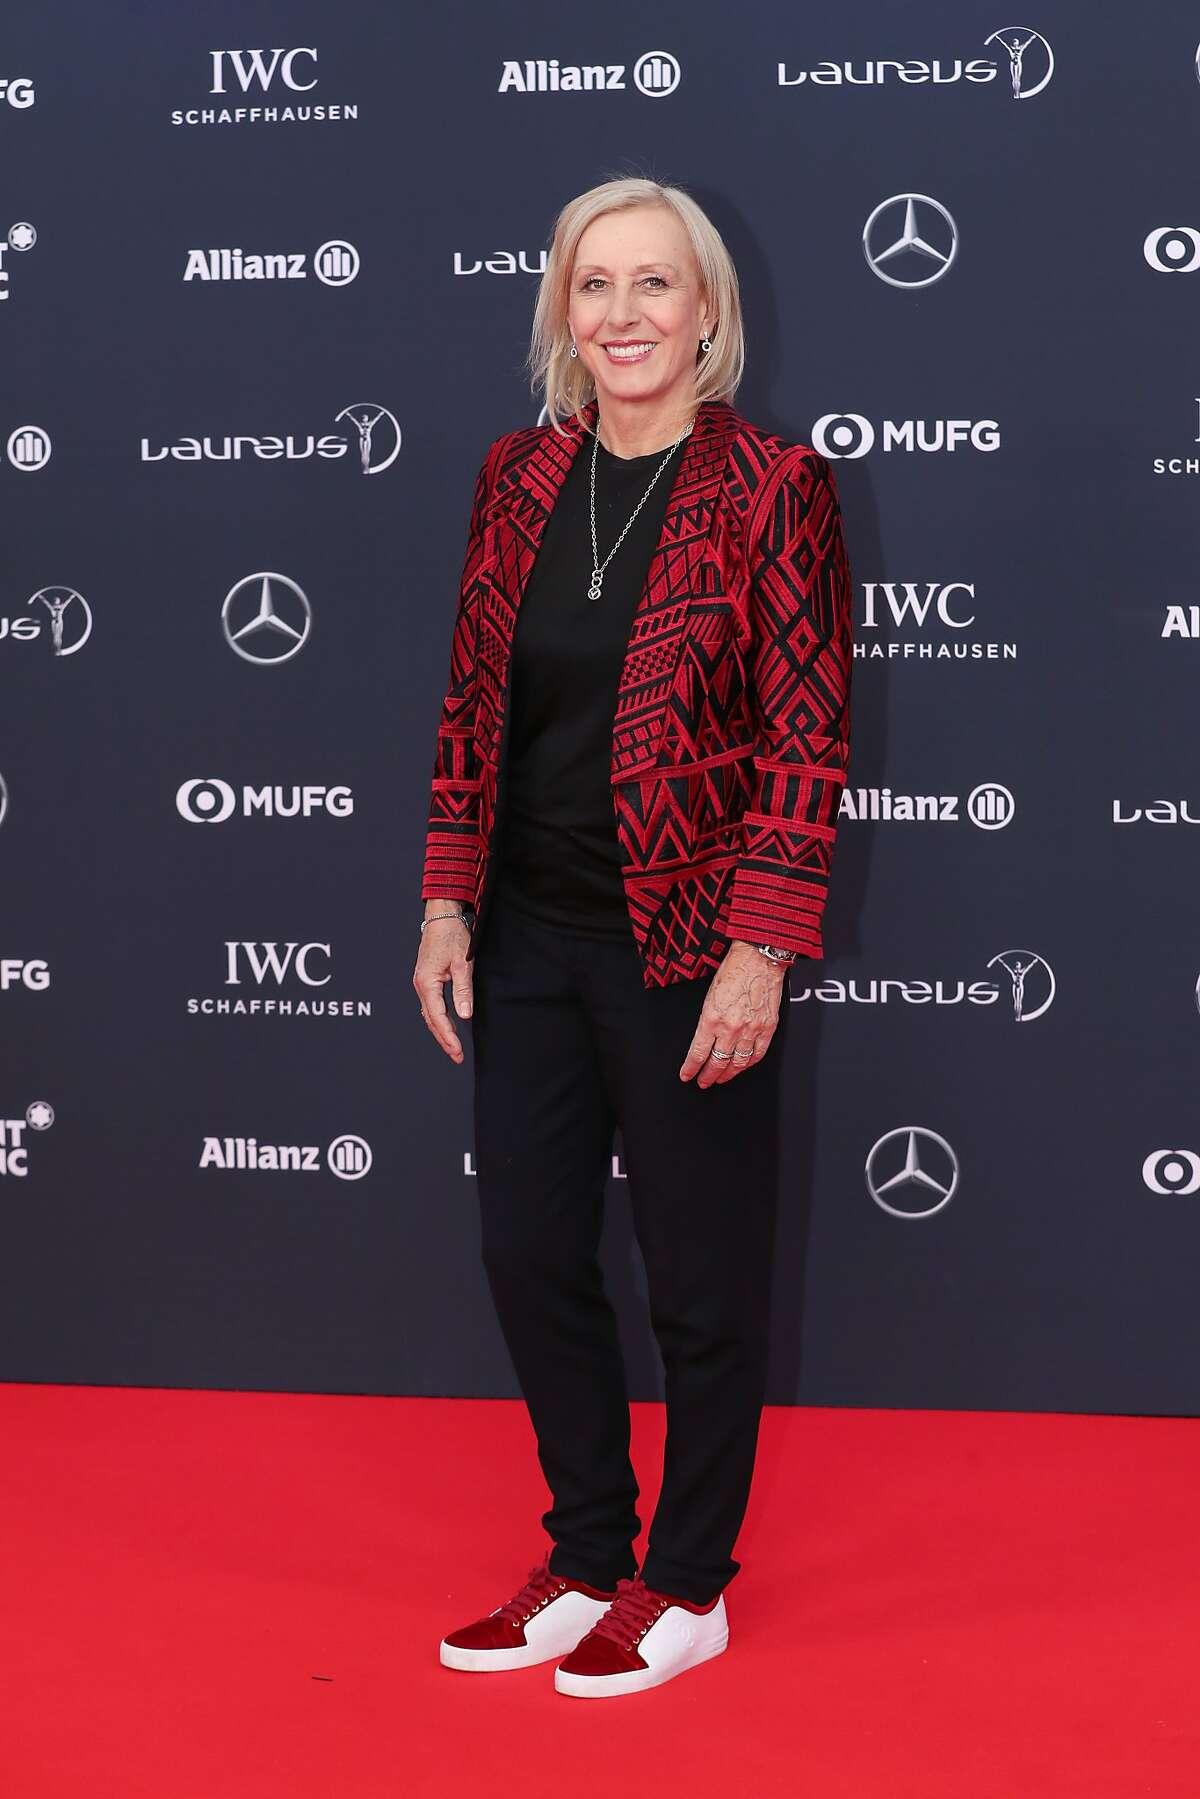 MONACO - FEBRUARY 27: Laureus Academy member Martina Navratilova attends the 2018 Laureus World Sports Awards at Salle des Etoiles, Sporting Monte-Carlo on February 27, 2018 in Monaco, Monaco. (Photo by Boris Streubel/Getty Images for Laureus)